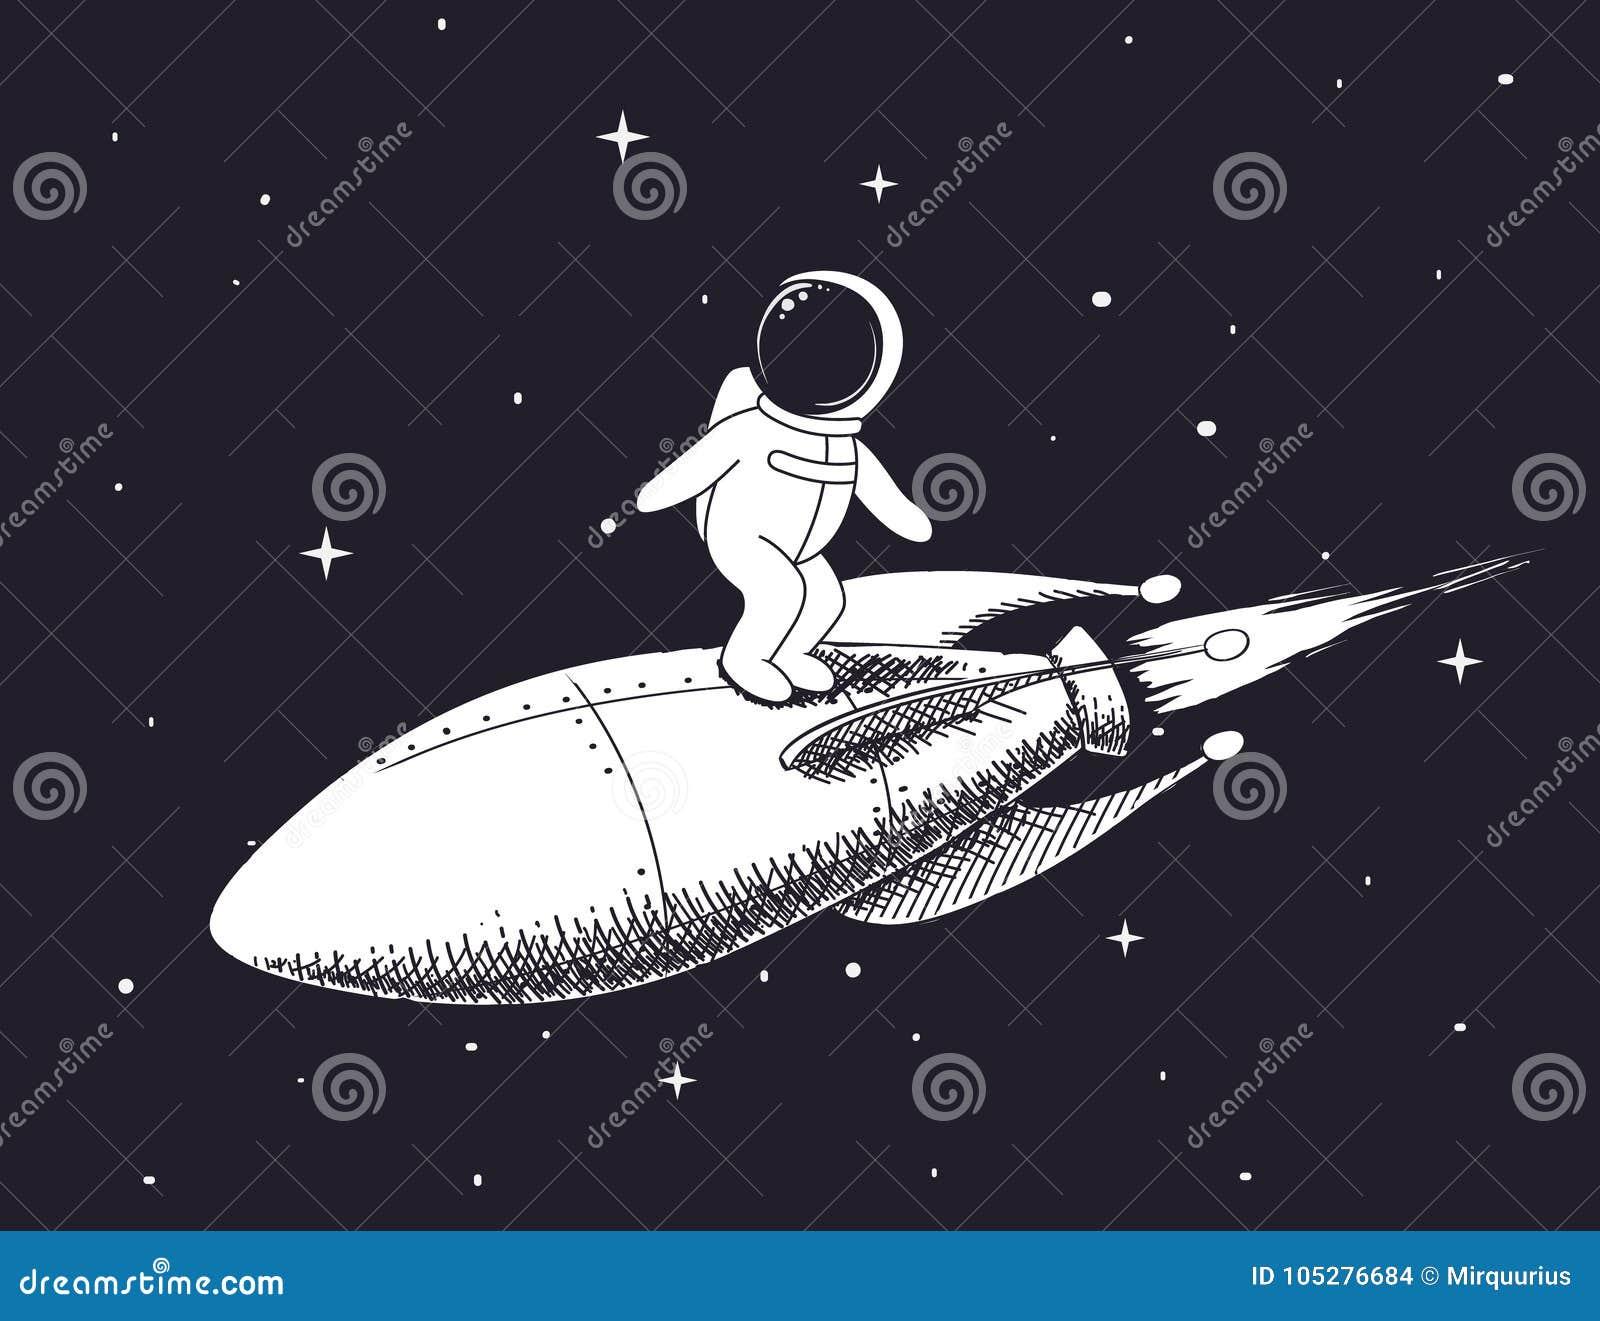 Spaceman flies on rocket